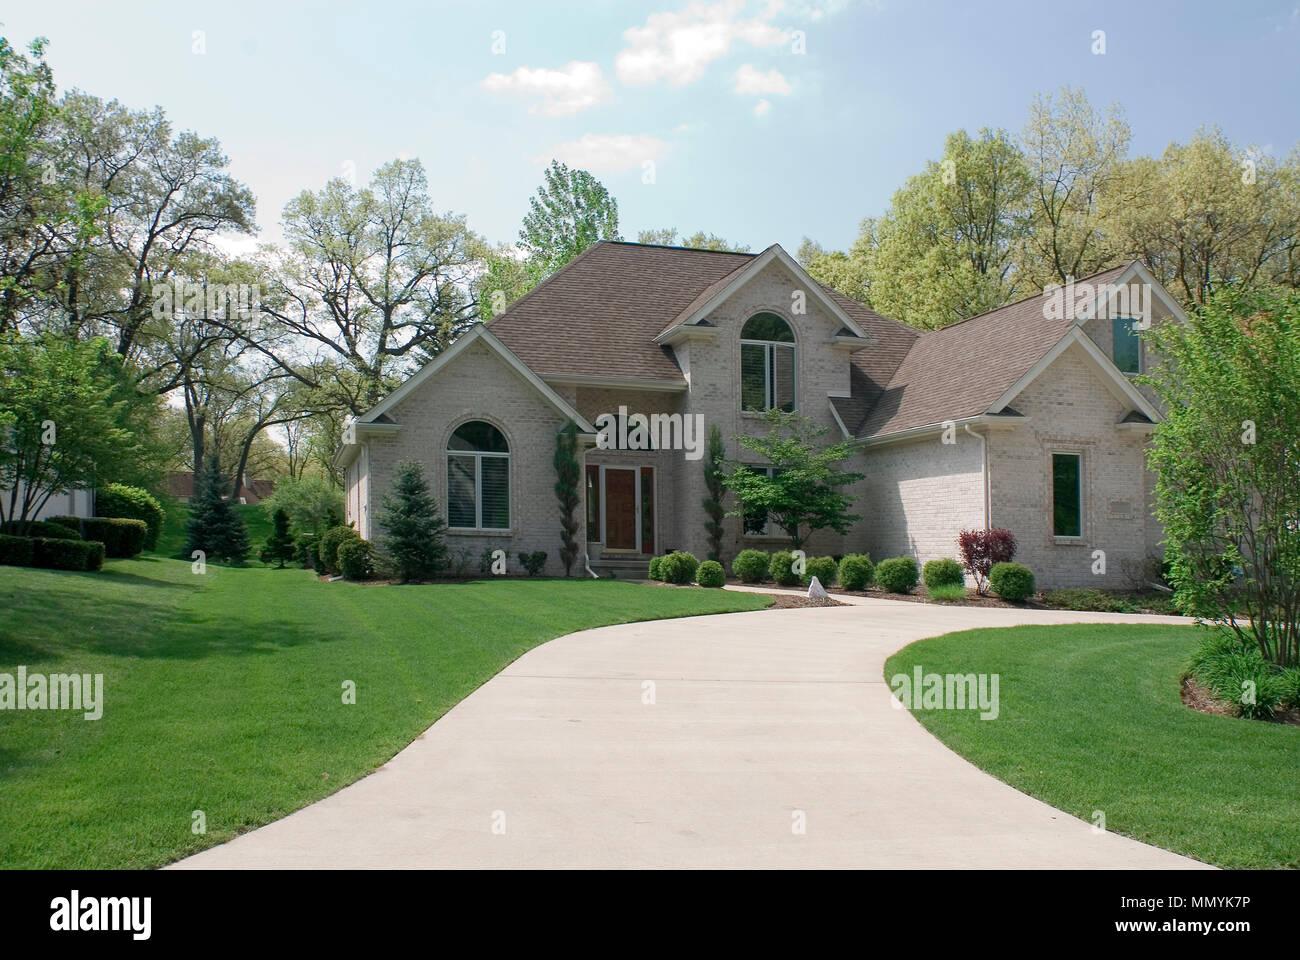 Beautiful Beige Brick Home Featuring A Complex Roof Design